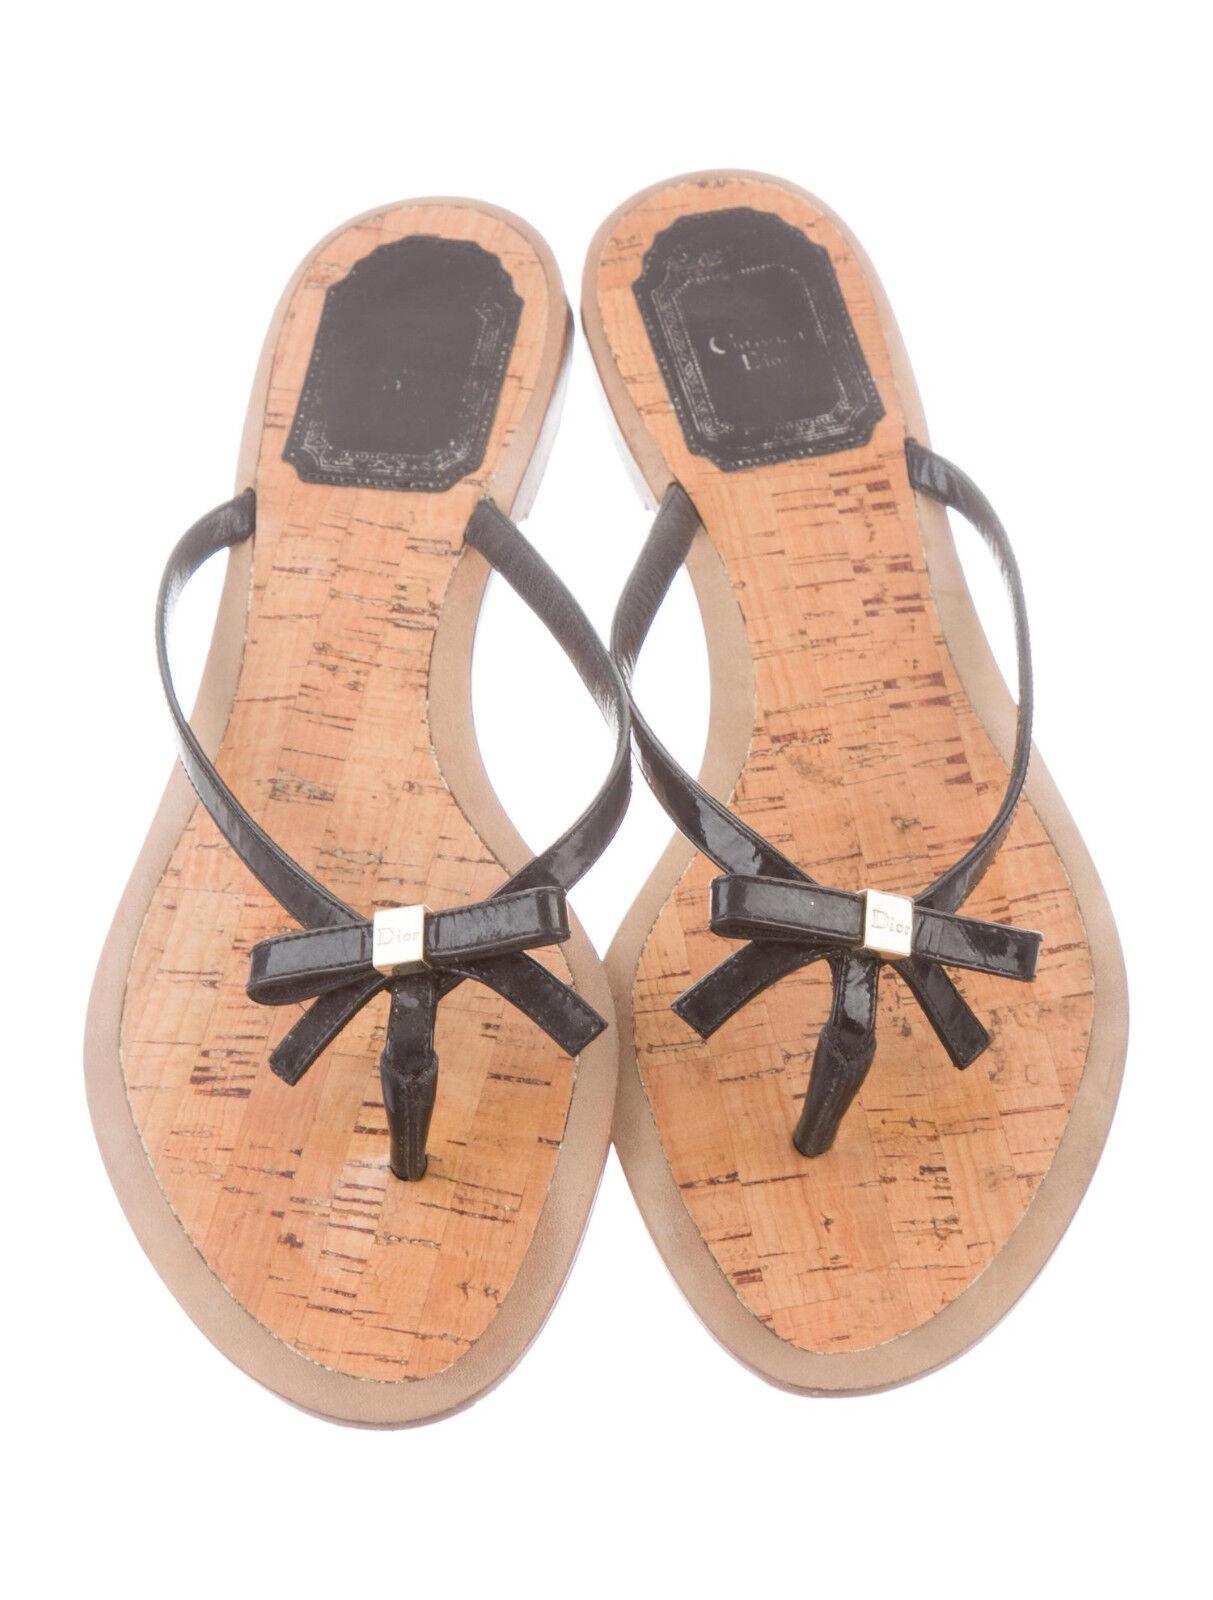 Christian Dior Flip Flop Sandalias Charol Charol Charol Negro Arco De Corcho  550 6.5 36.5  descuento online